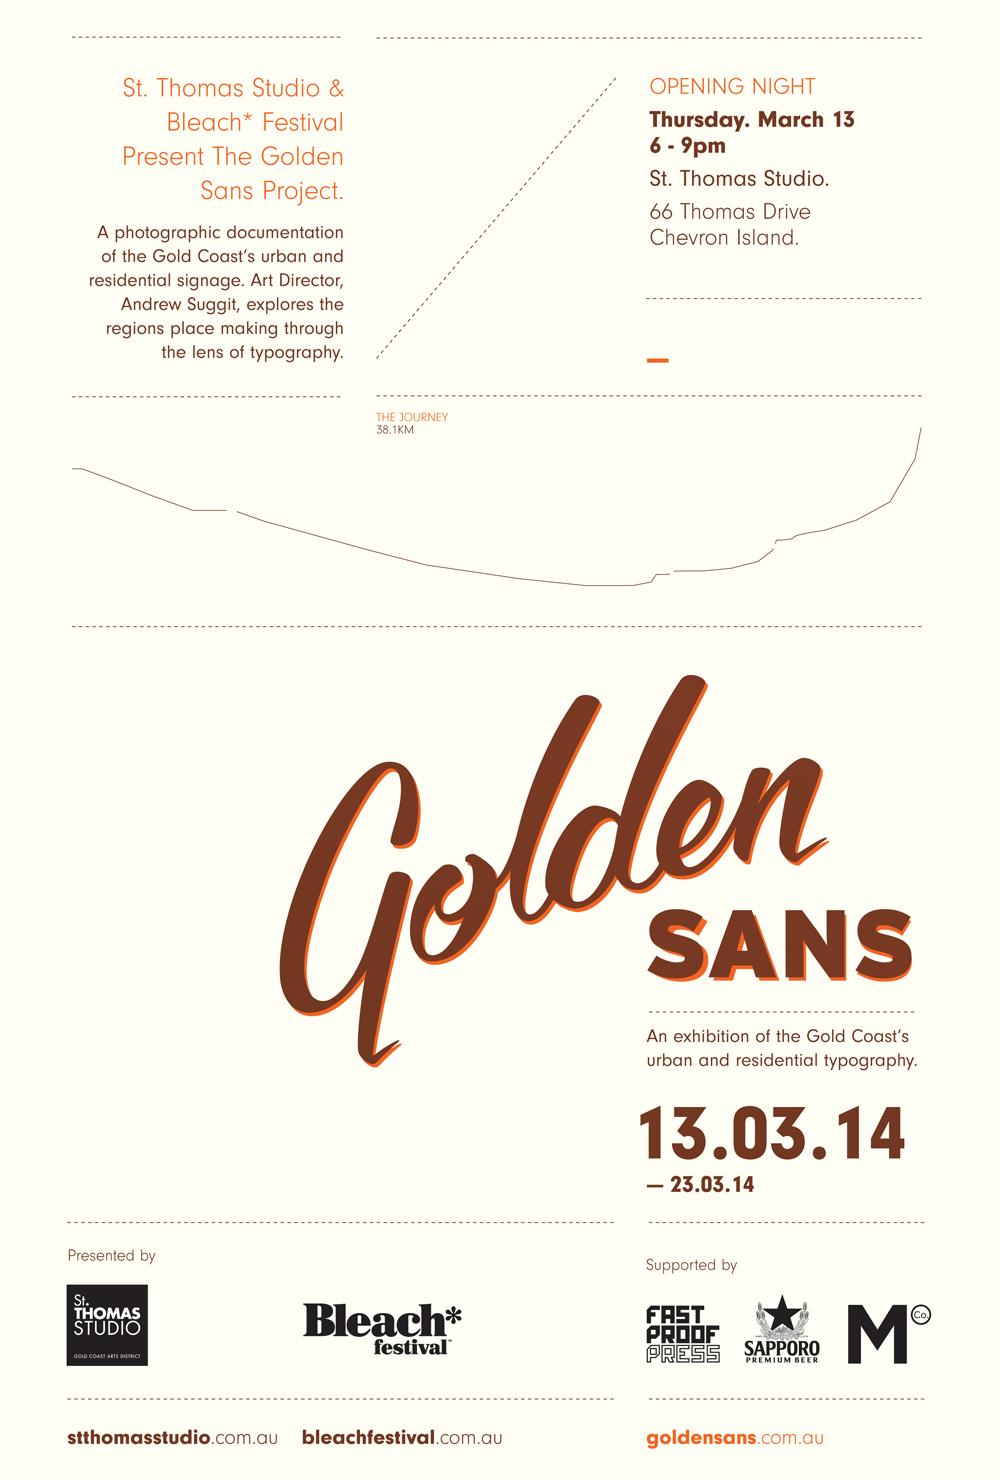 The Golden Sans Project_SHOW.jpg